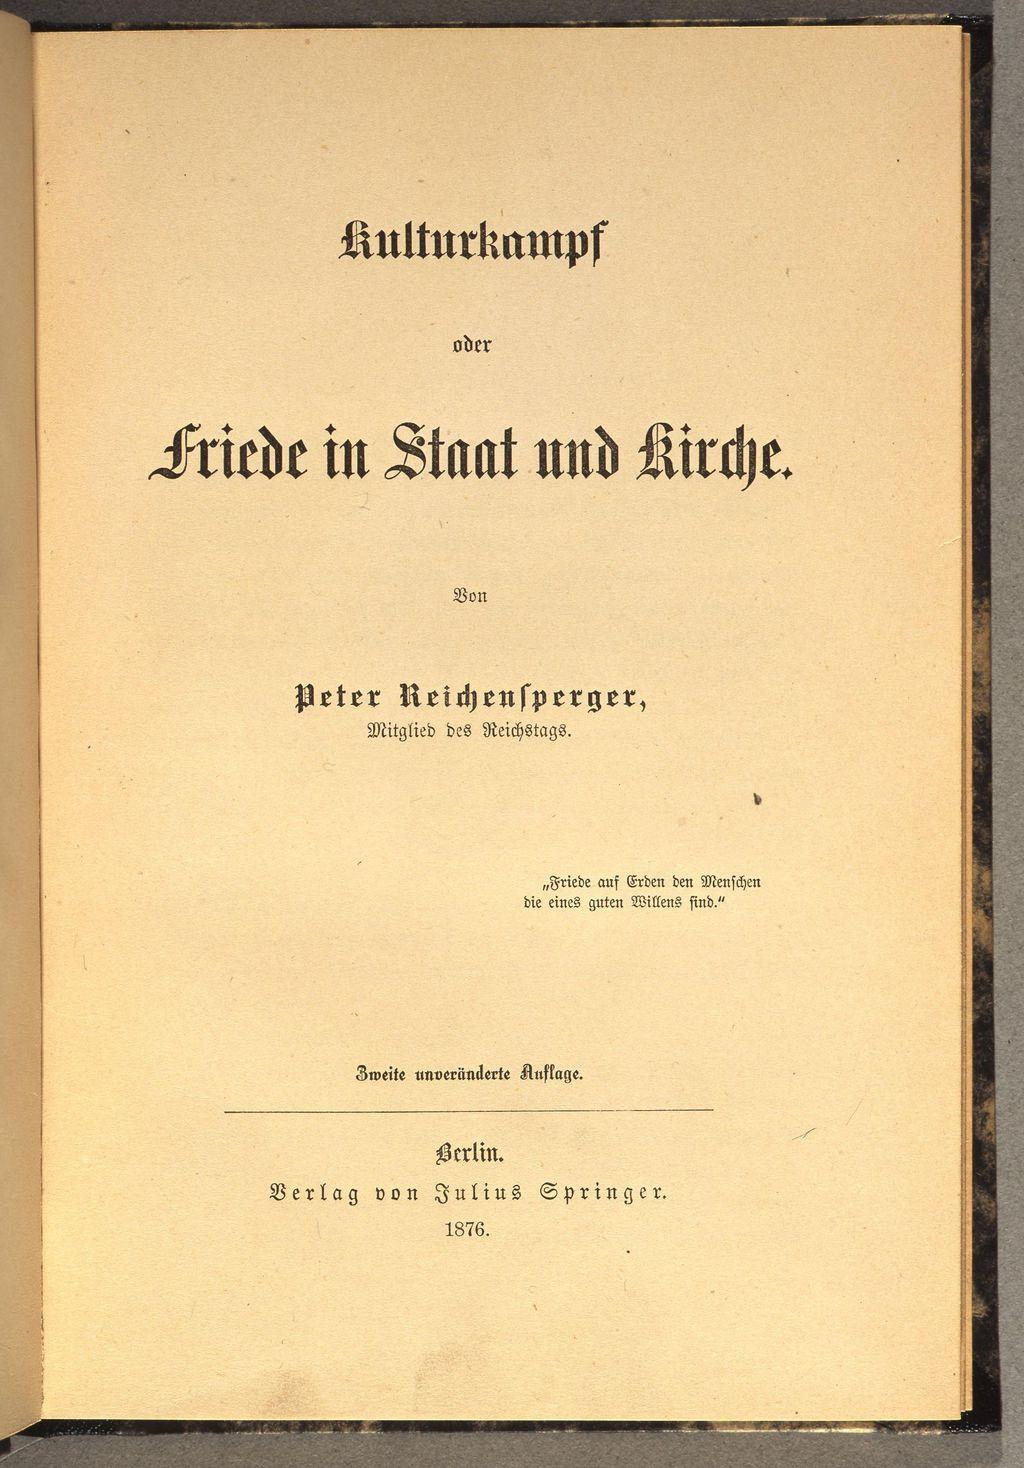 Lemo Kapitel Kaiserreich Innenpolitik Kulturkampf